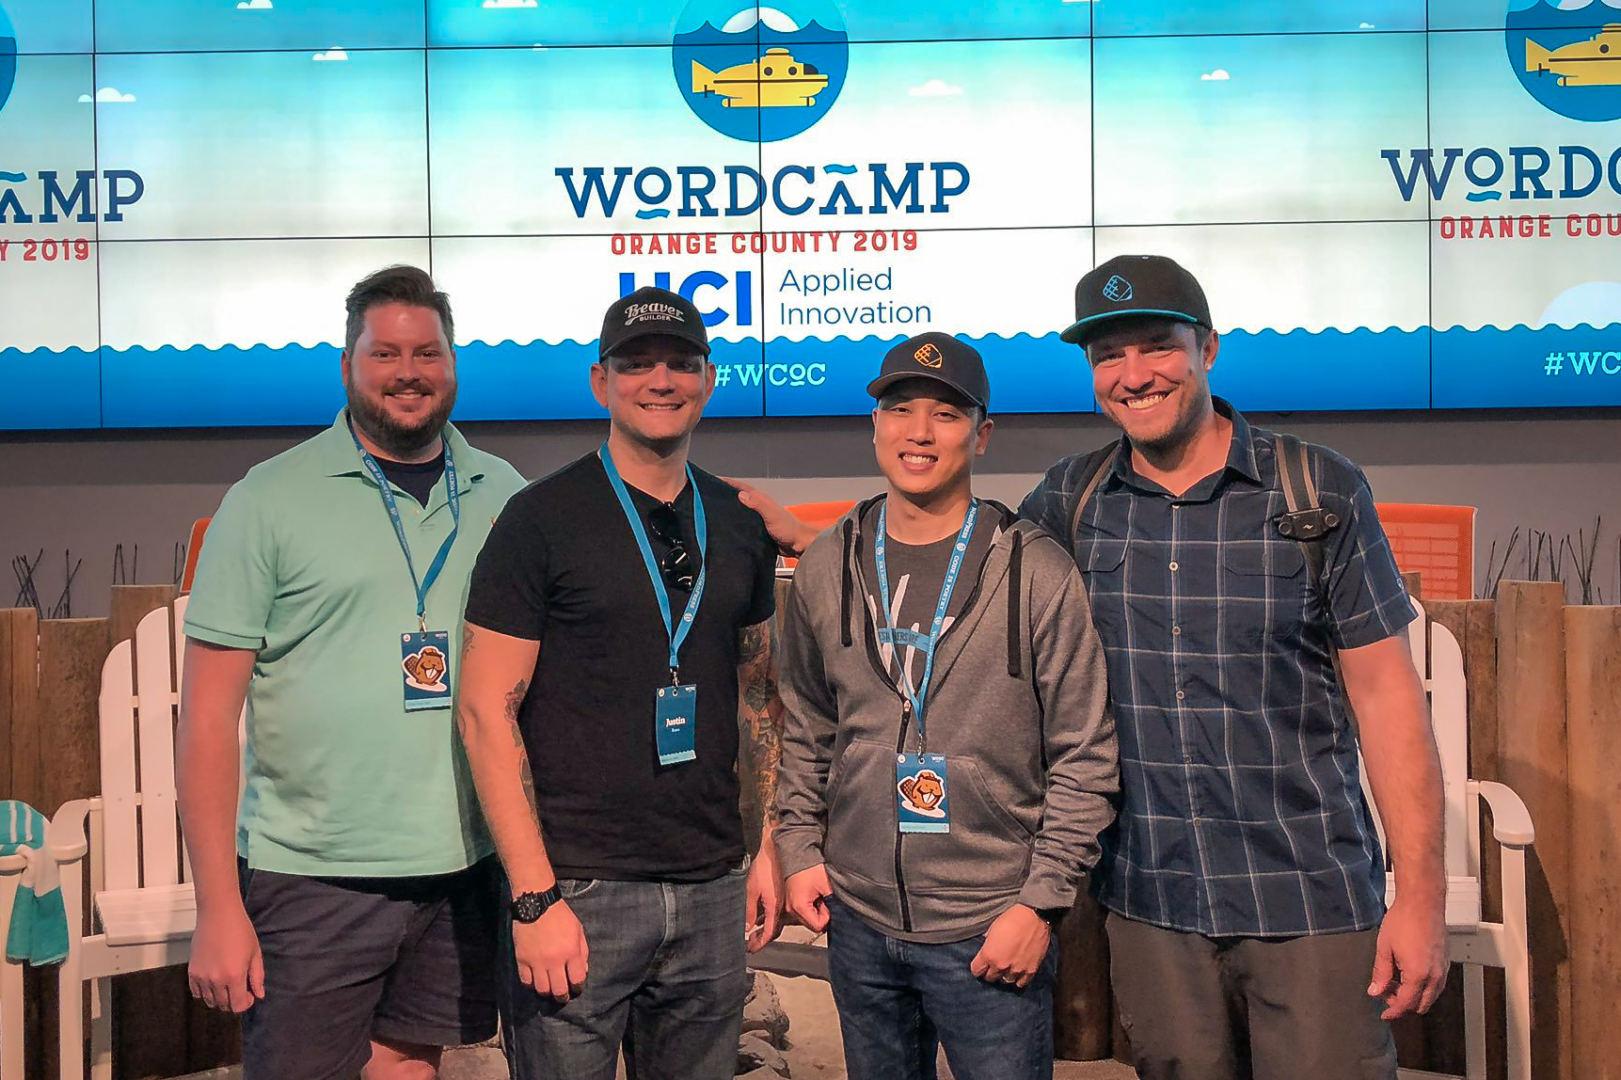 WordCamp Orange County, WordCamp OC, WCOC, WordPress, Plugin-Palooza, Plugin-a-Palooza